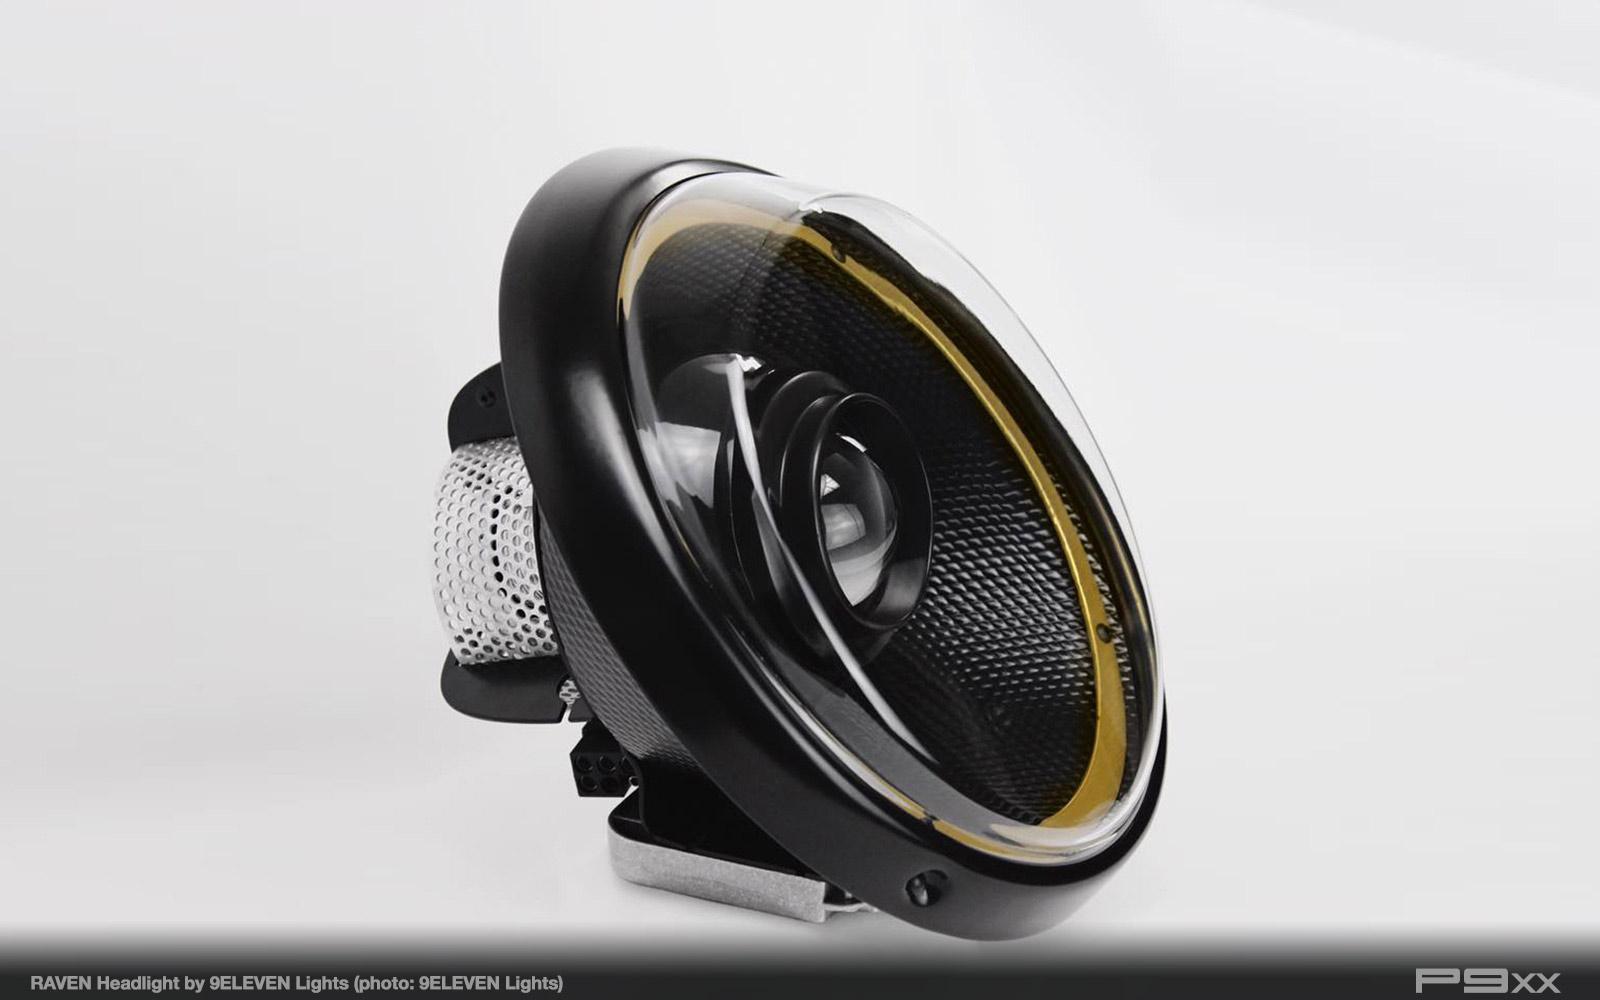 9Eleven Headlights Raven LED Headlight